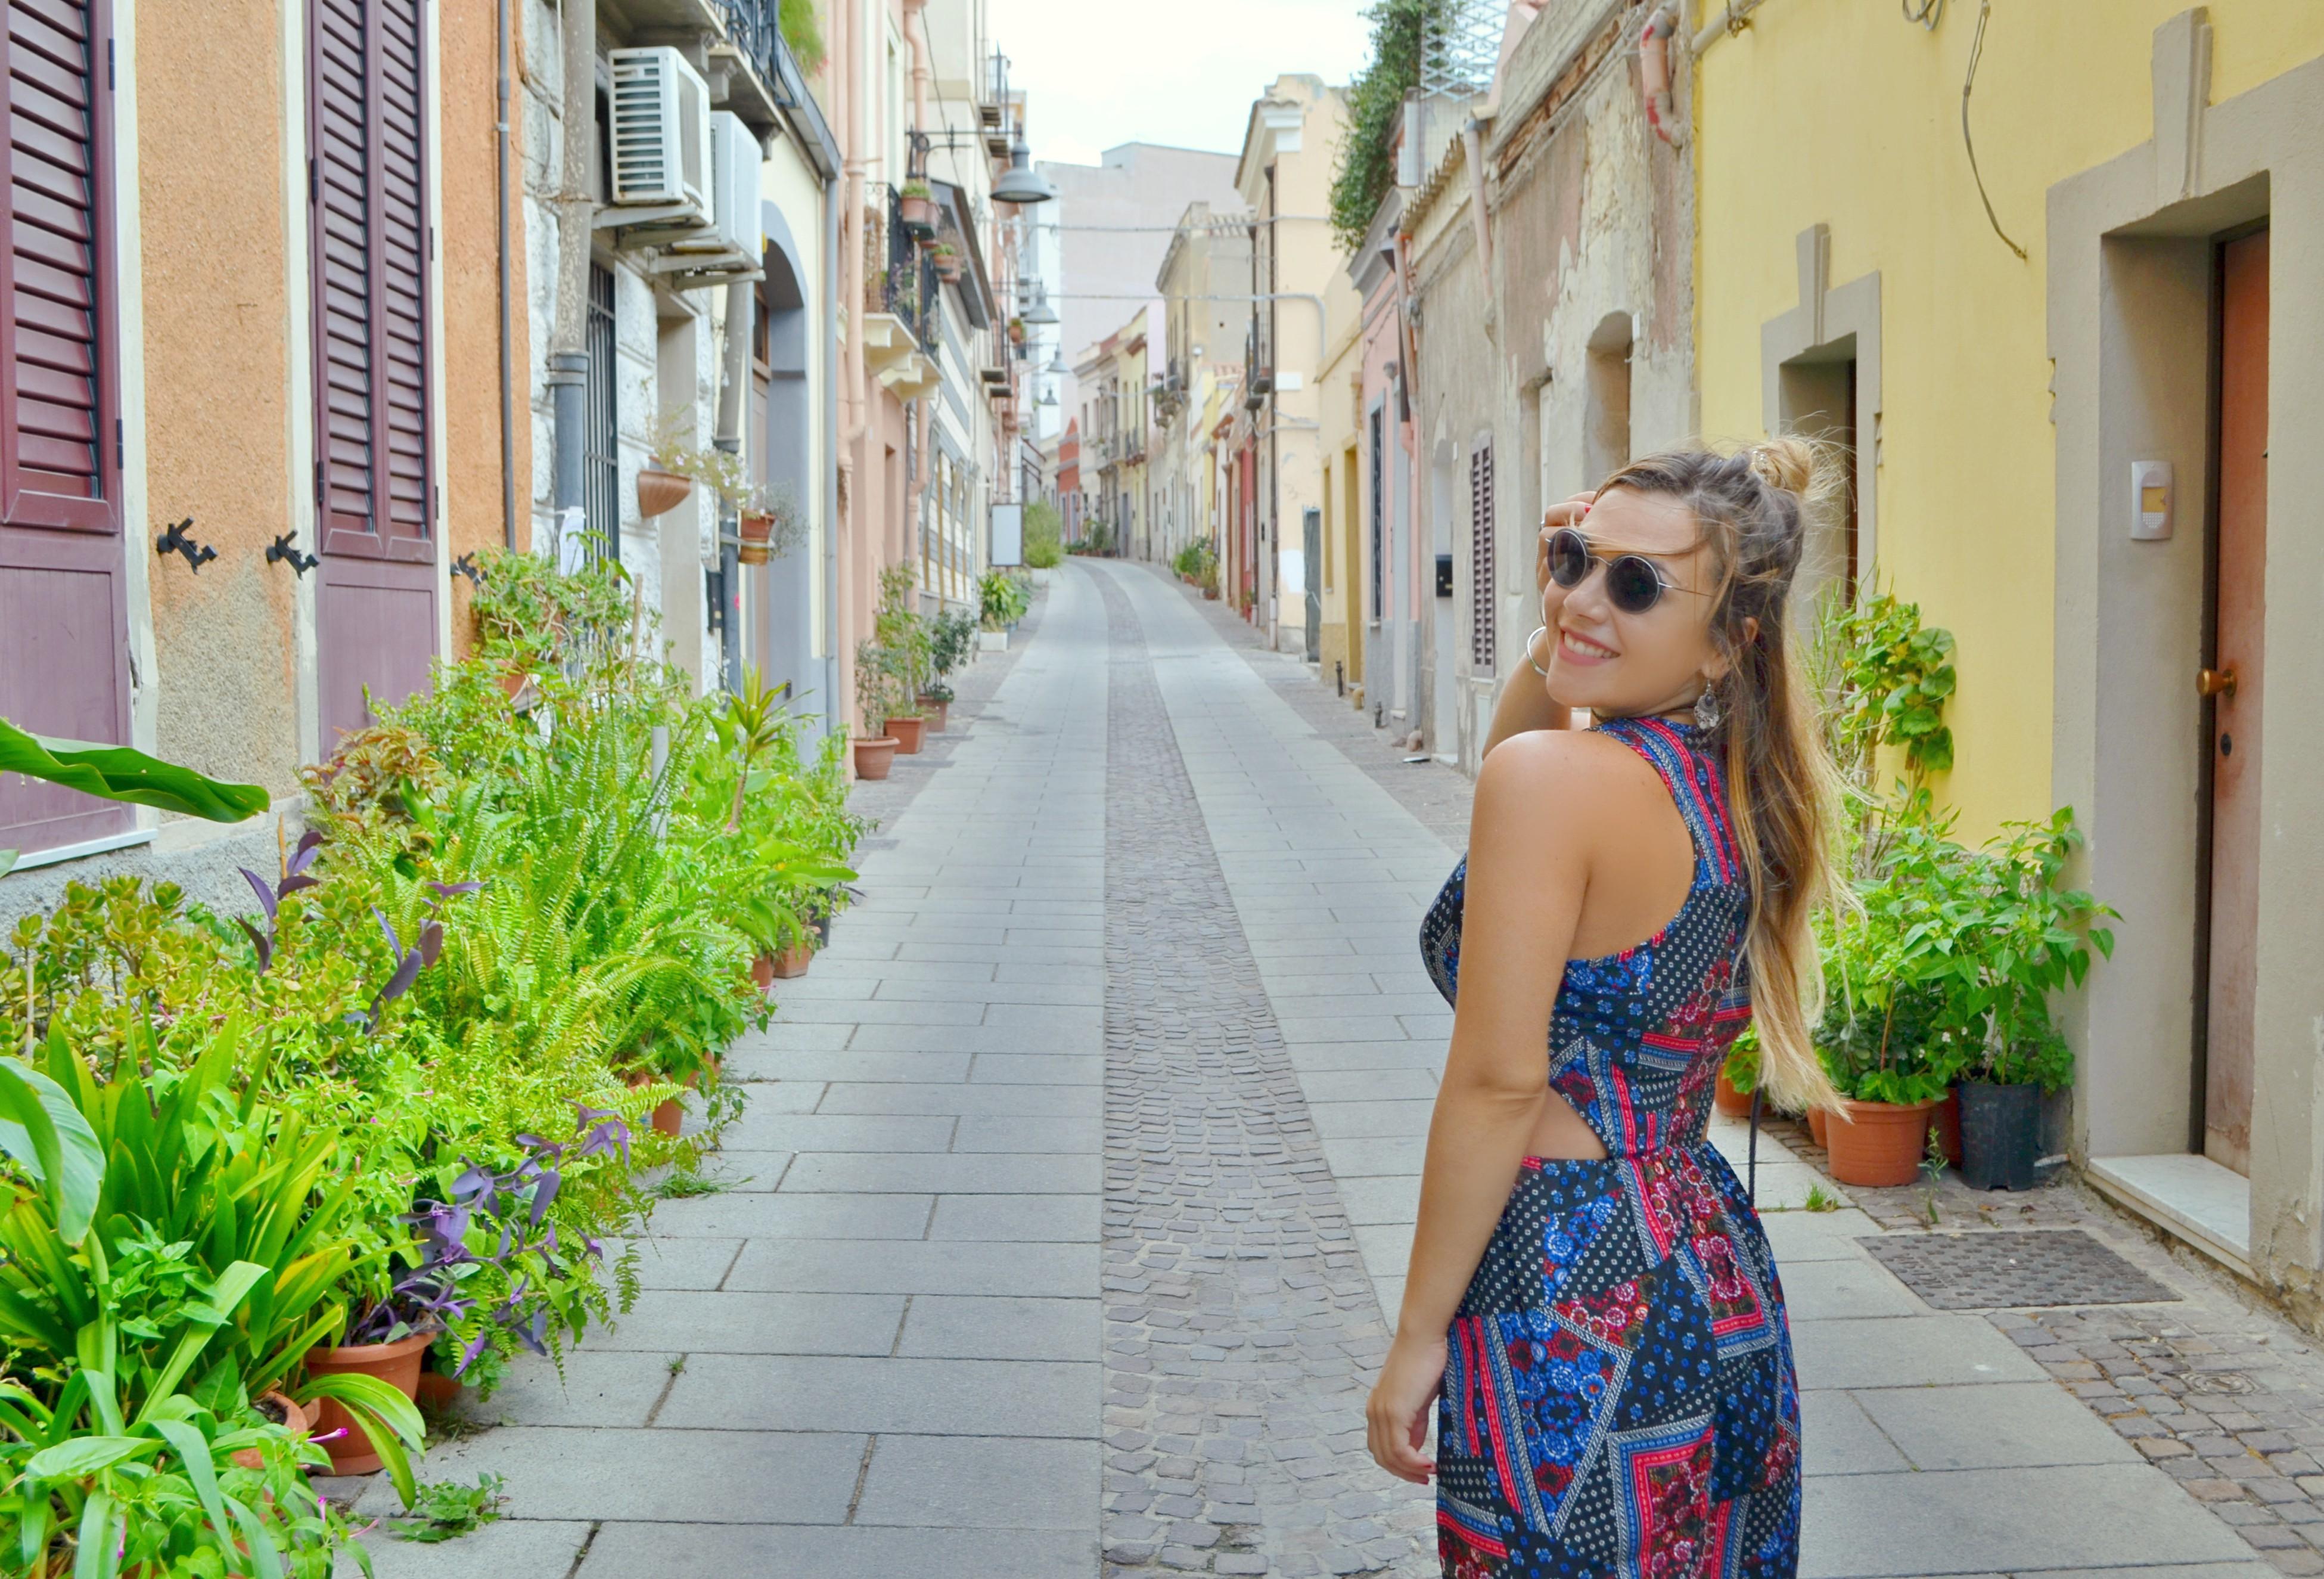 Fashionista-blog-de-moda-ChicAdicta-influencer-Chic-Adicta-vestidos-estampados-travel-blogger-silhouette-PiensaenChic-Piensa-en-Chic